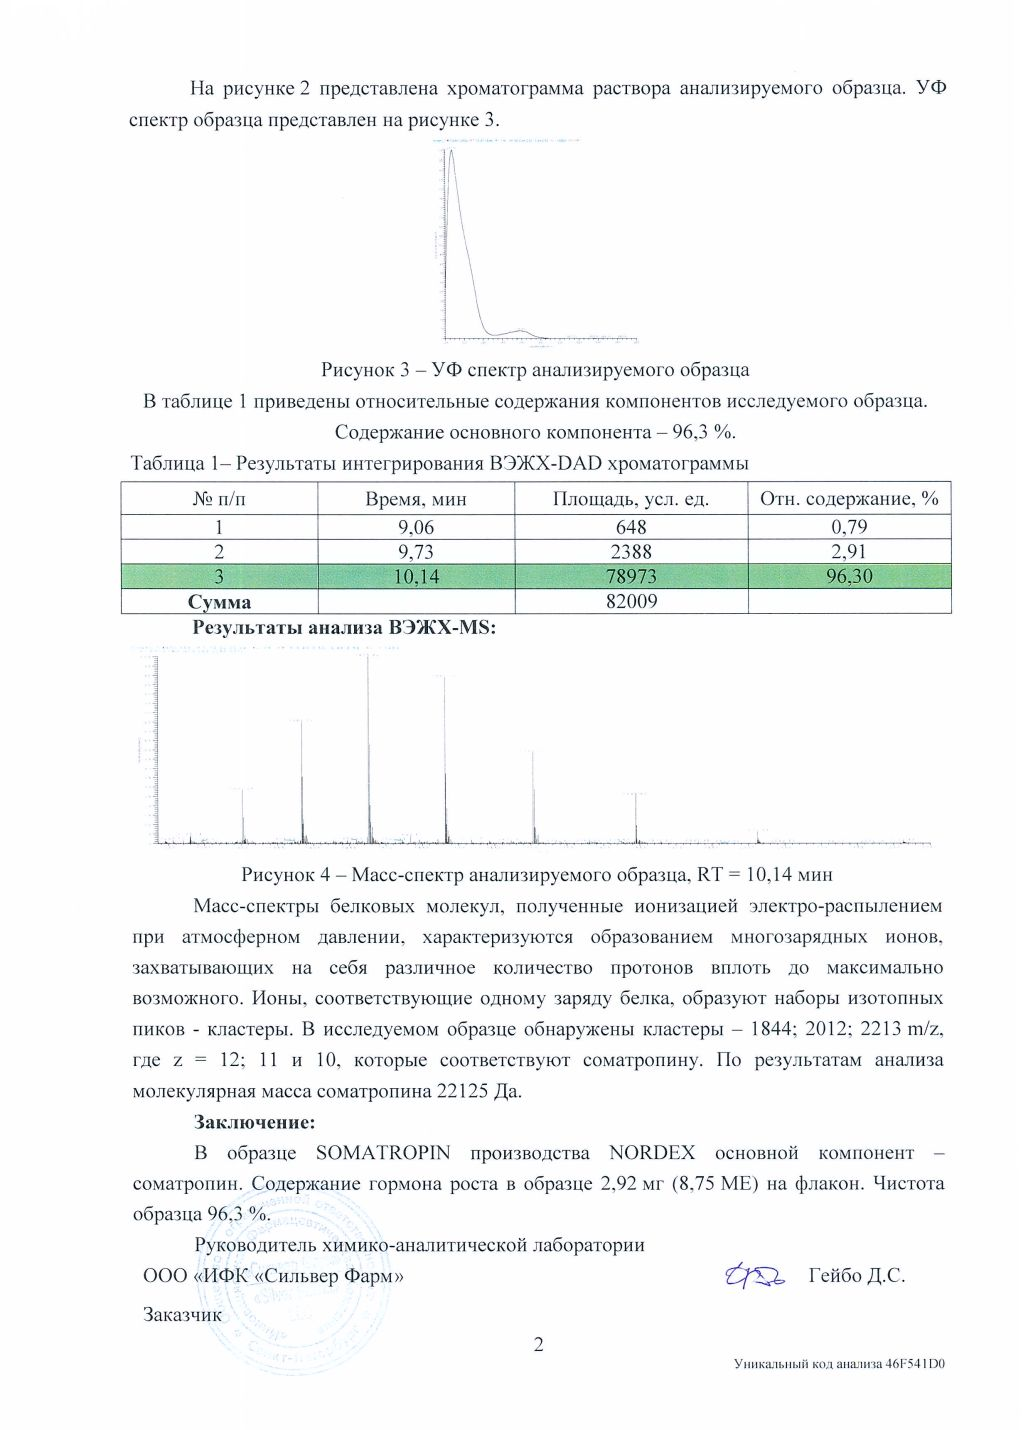 Nordex_somatropin_chromatography_02.jpg